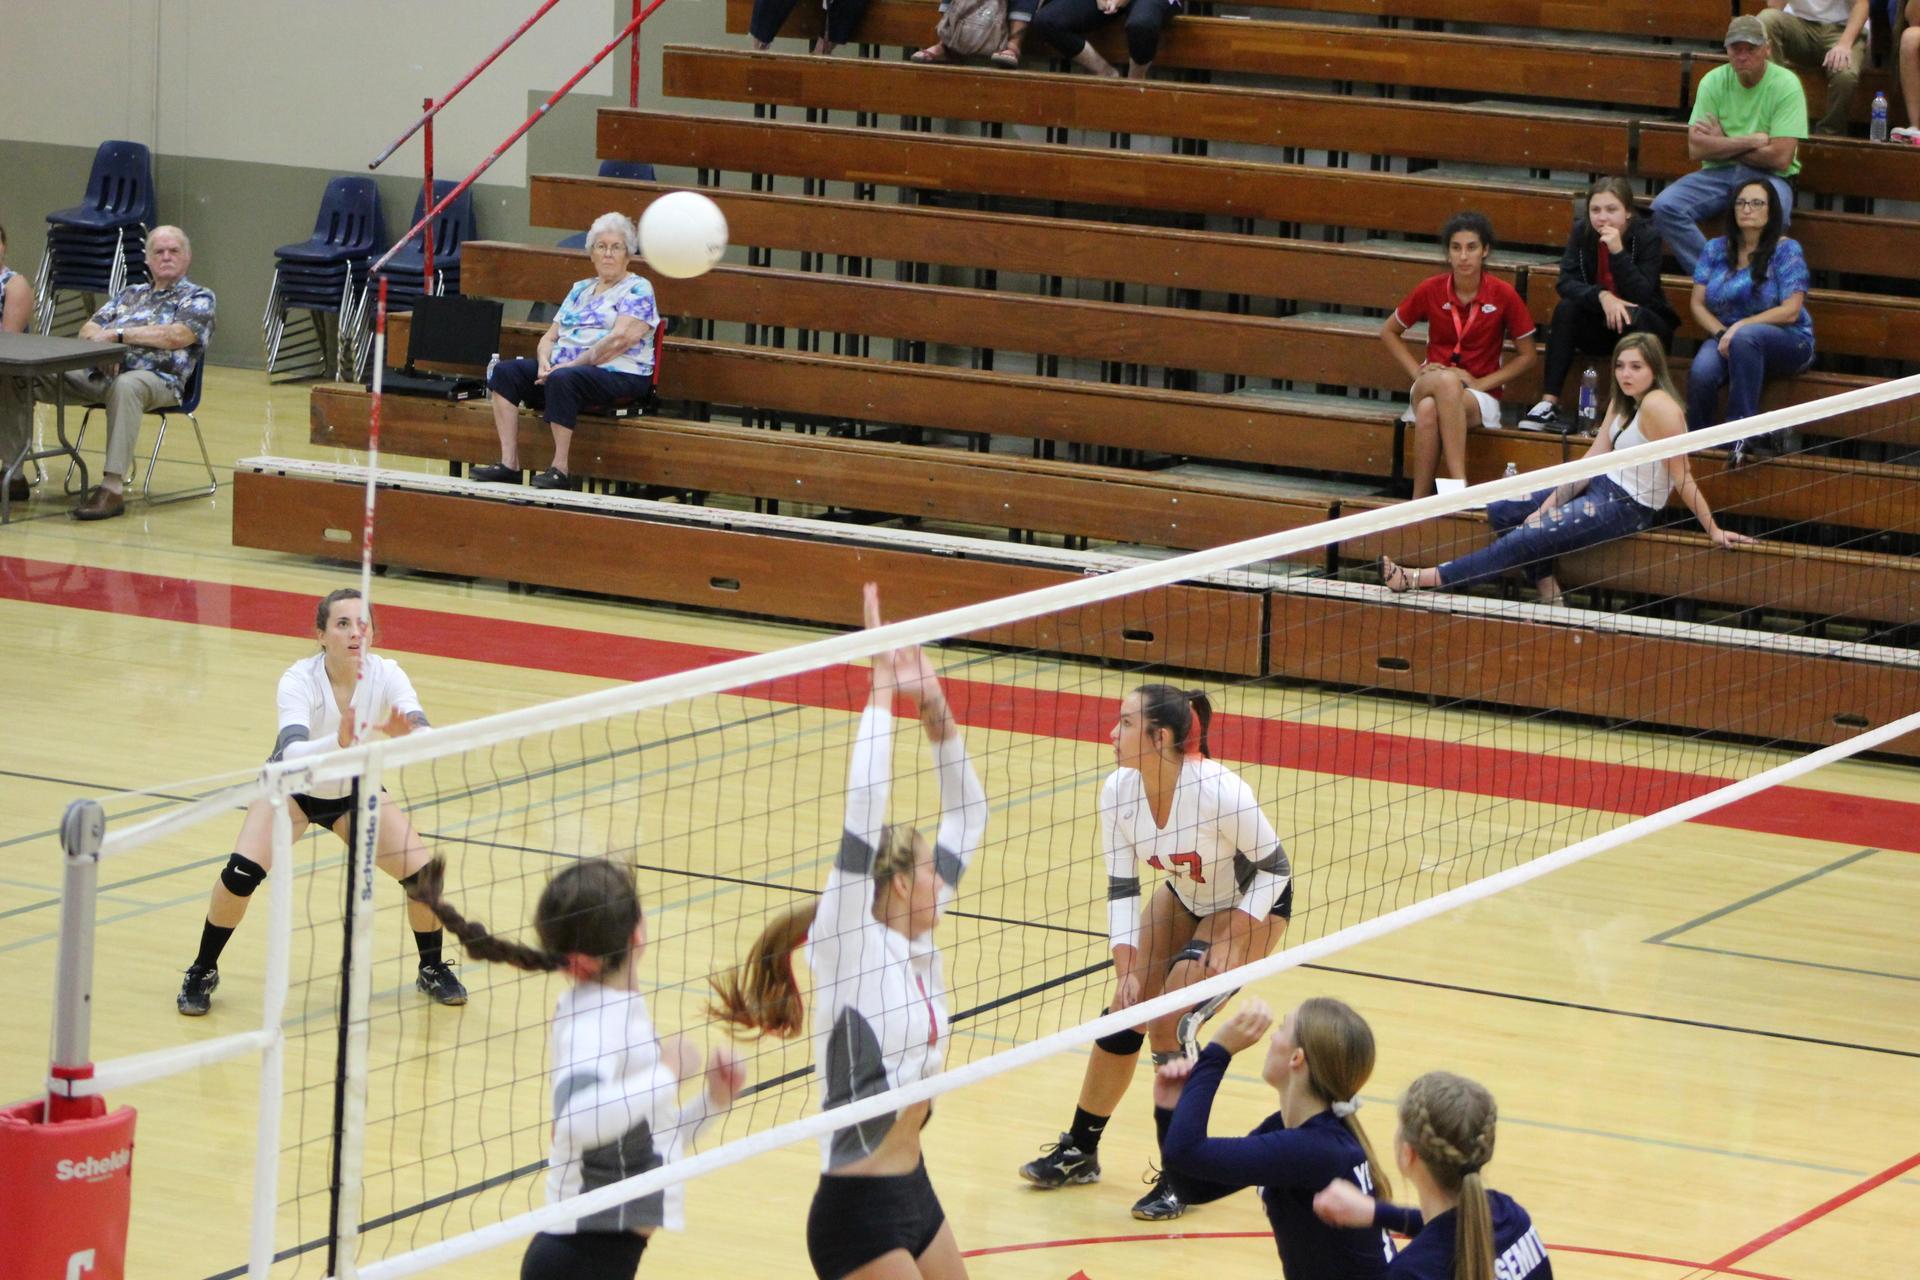 Girls playing volleyball against Yosemite